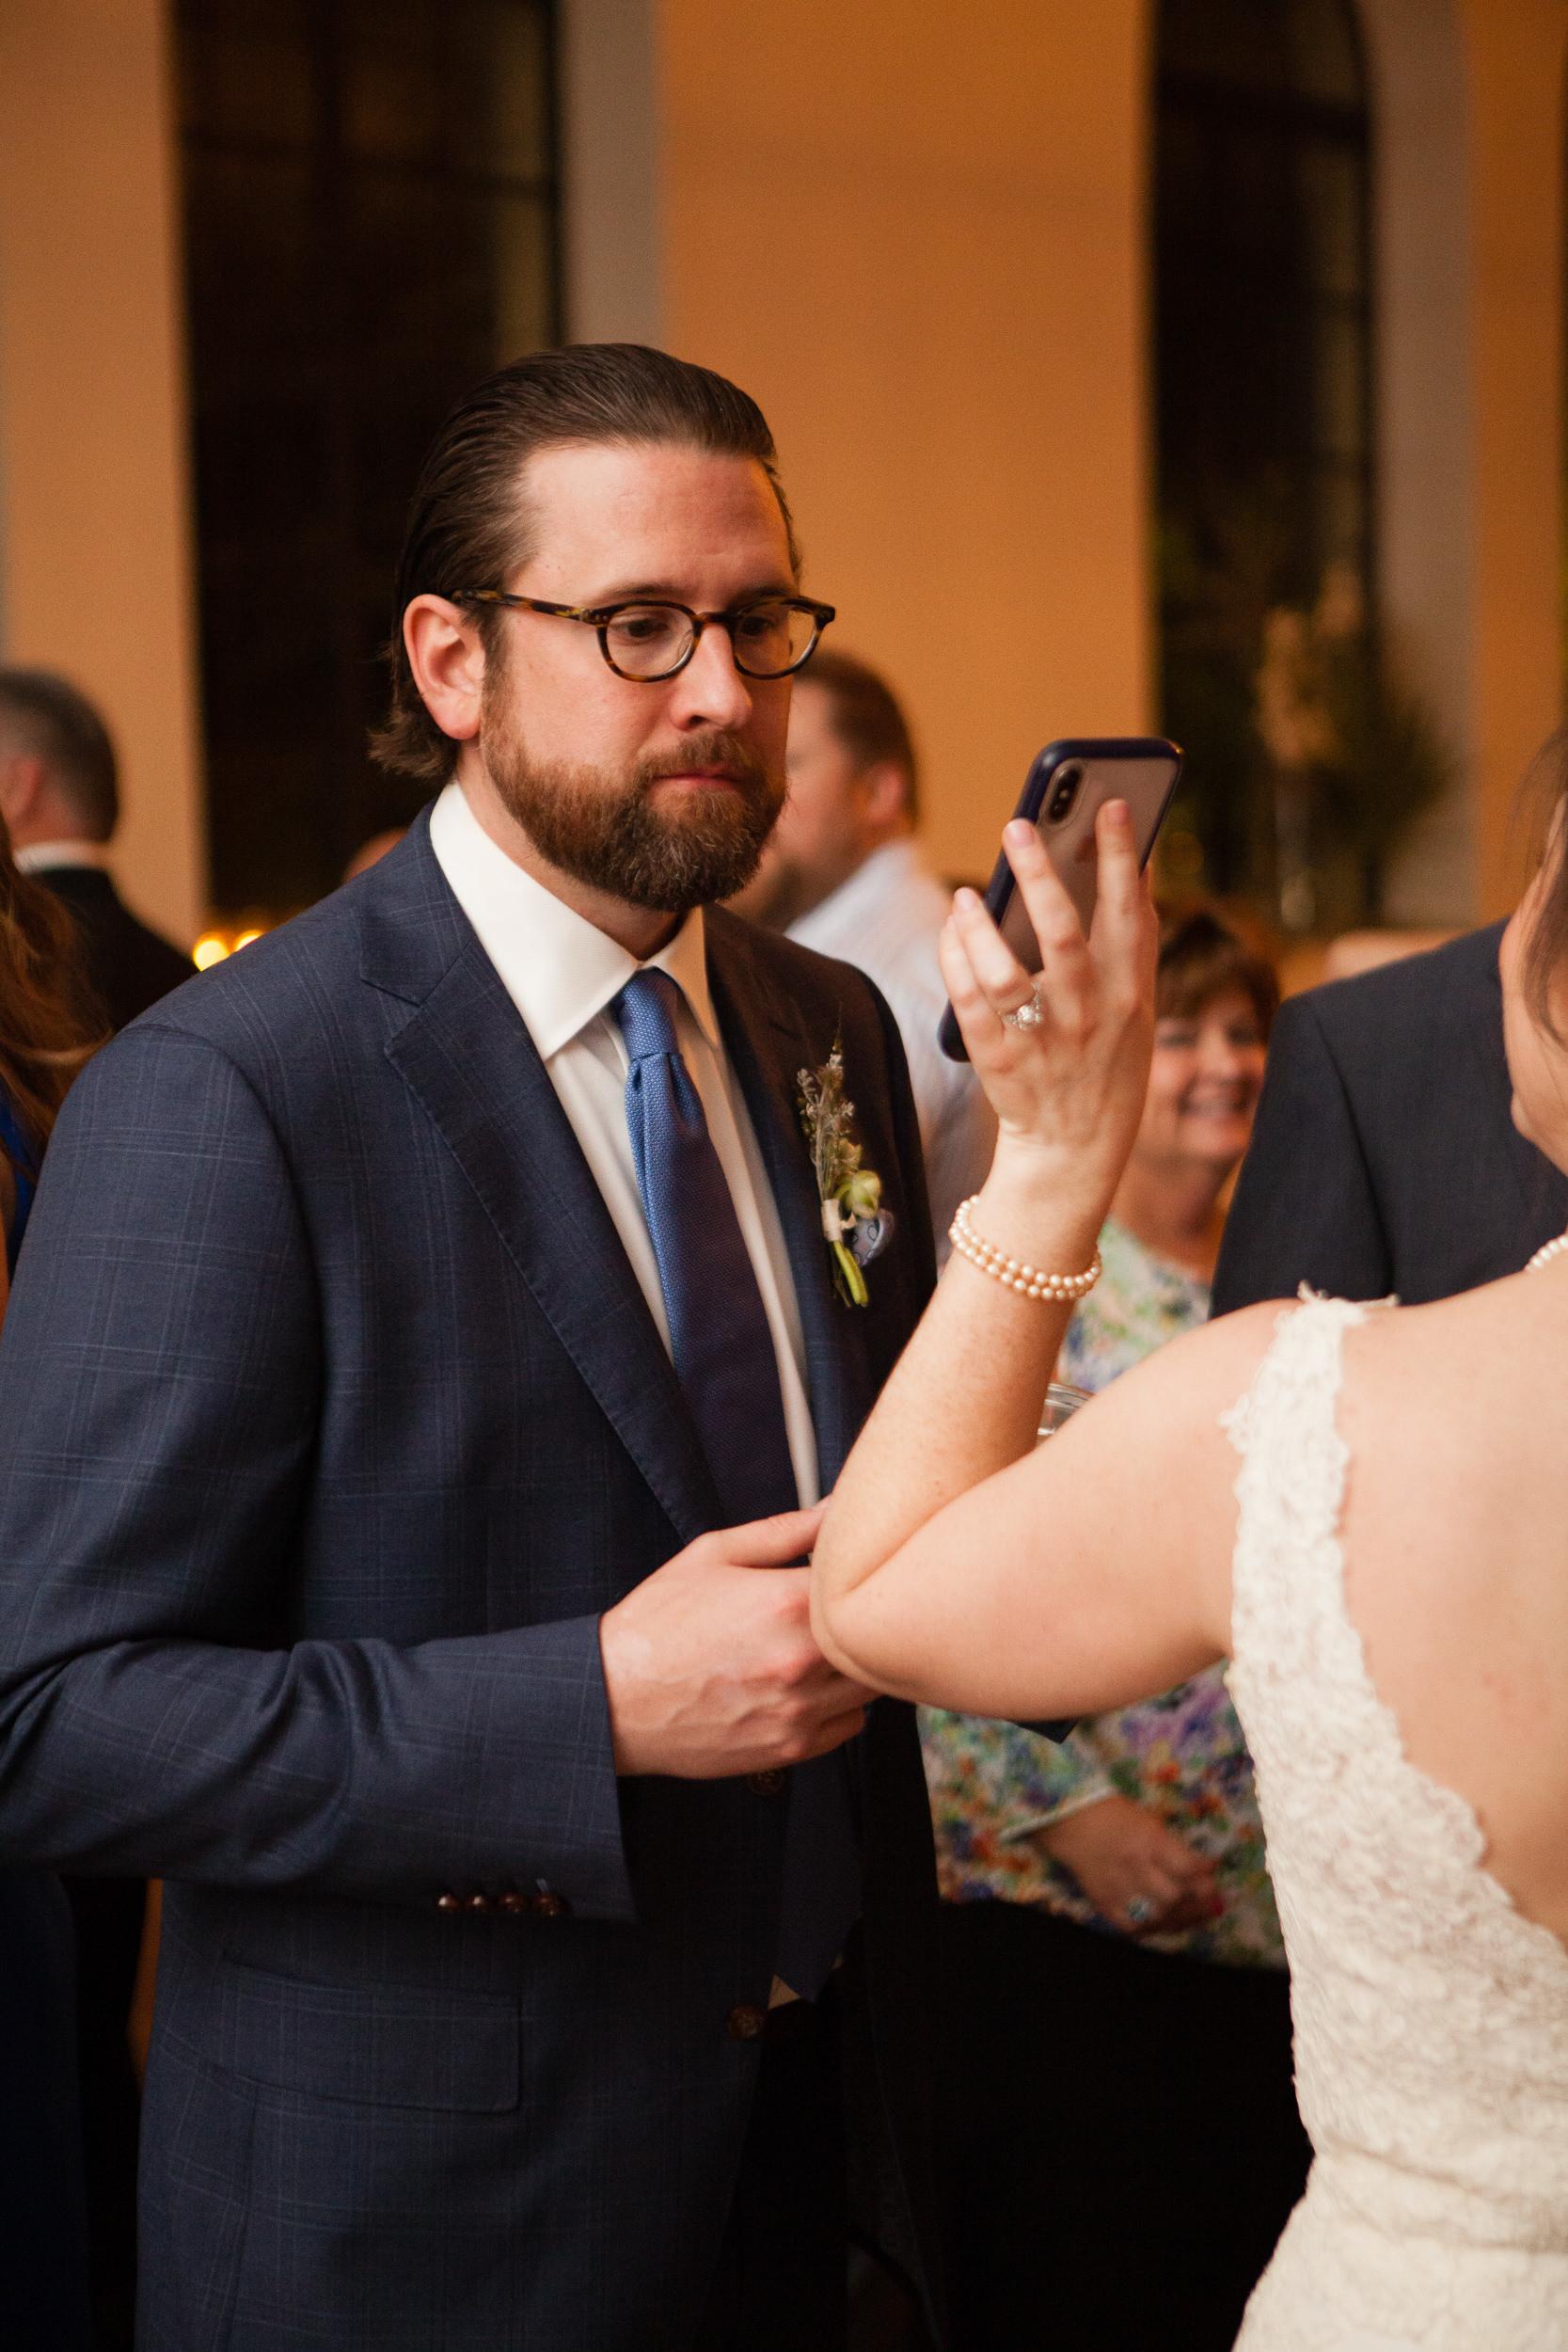 LK_Birmingham_AL_Wedding_2019-00069.jpg